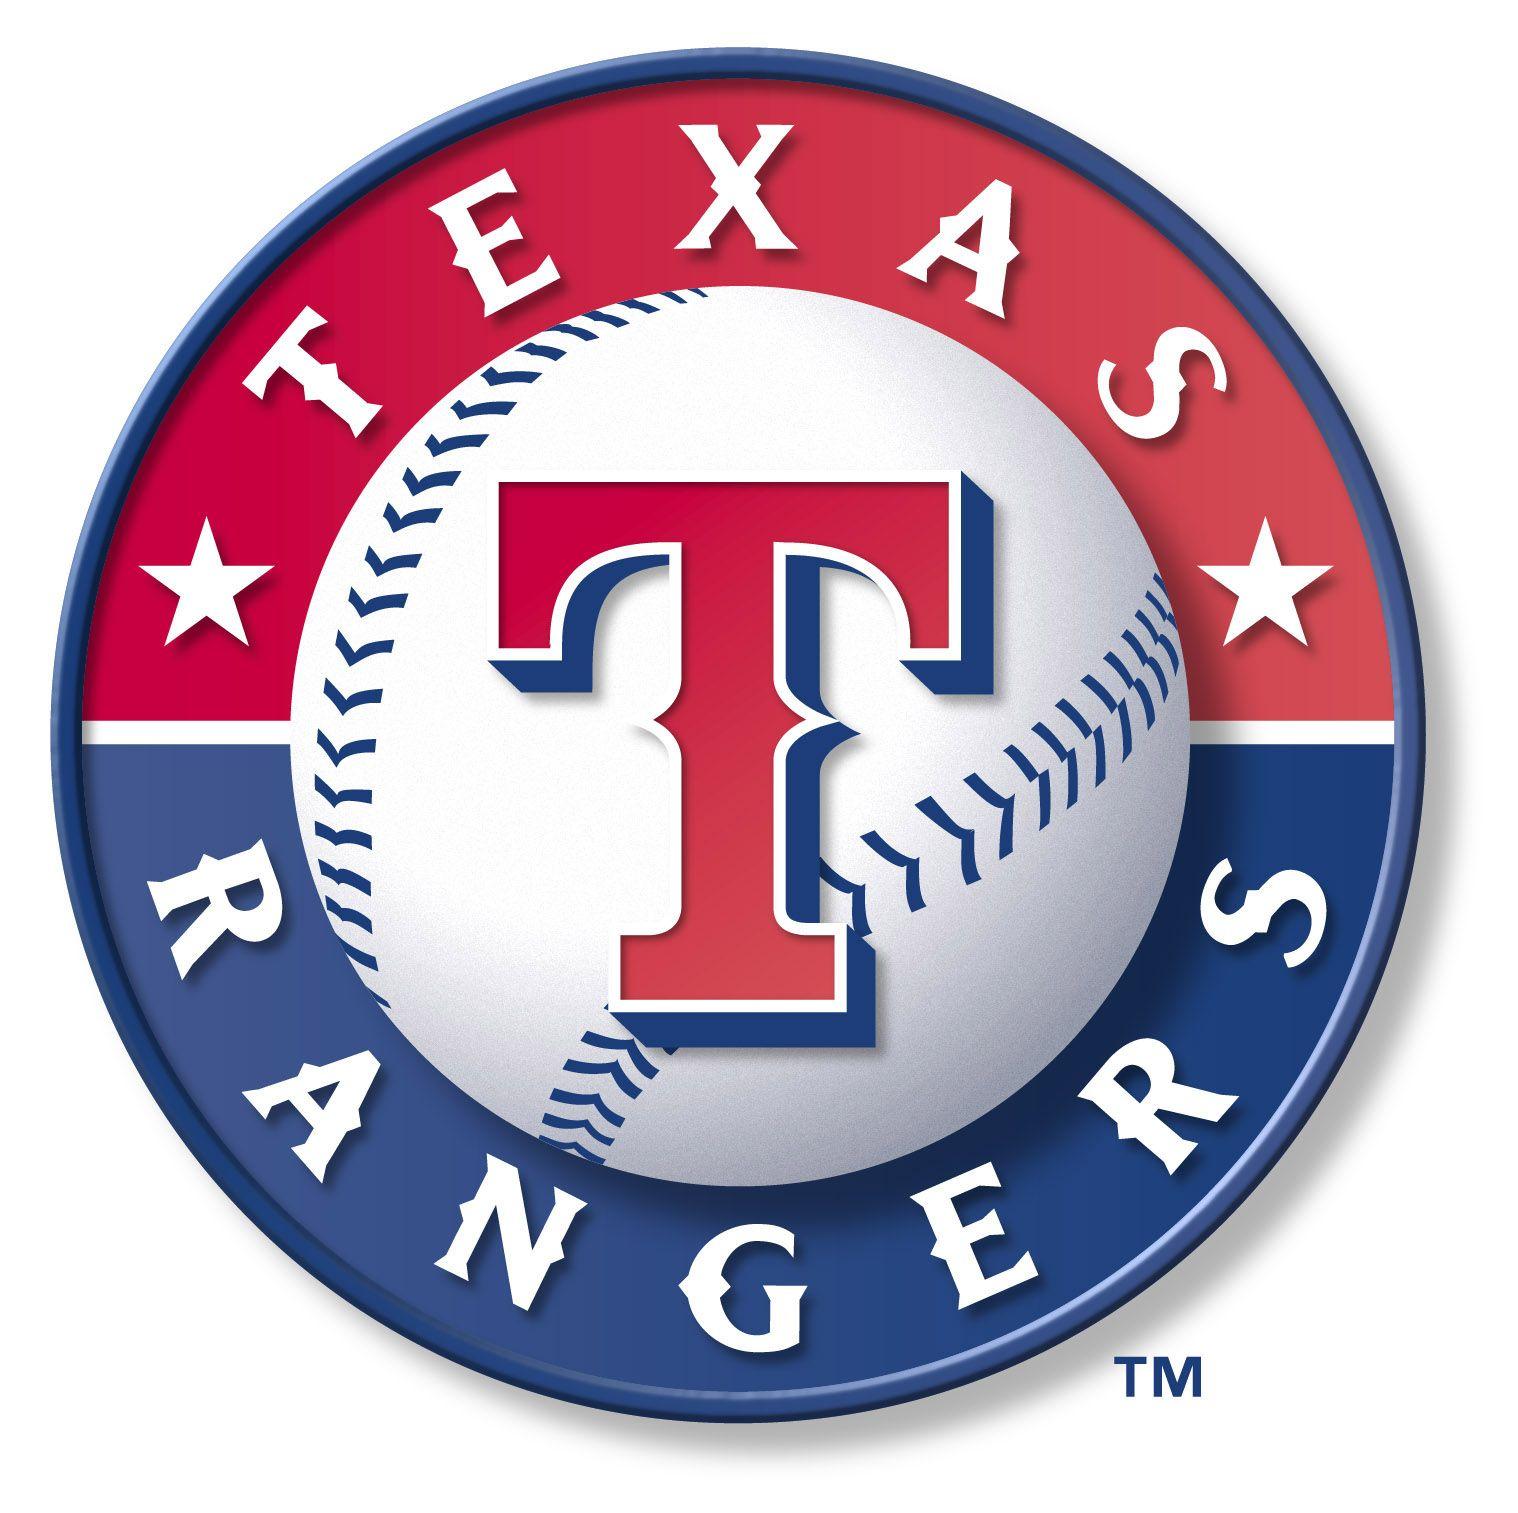 2013 texas rangers photo Yahoo! Search Results Texas